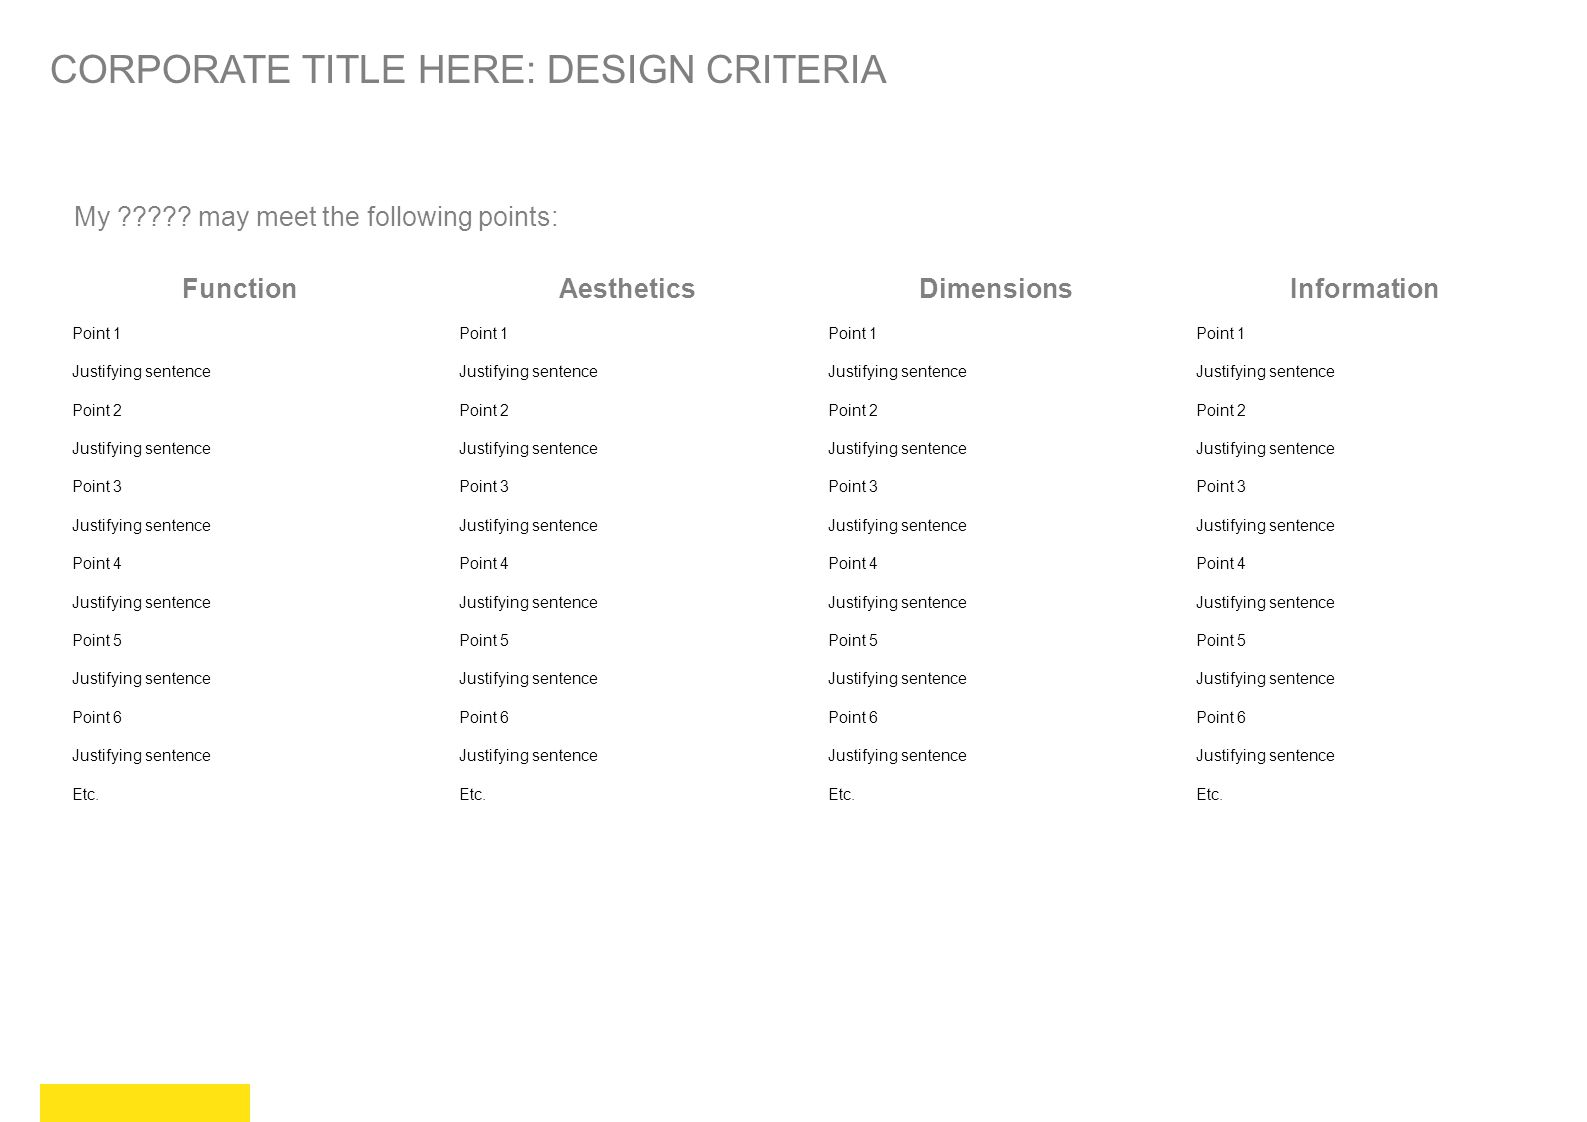 CORPORATE TITLE HERE: DESIGN CRITERIA